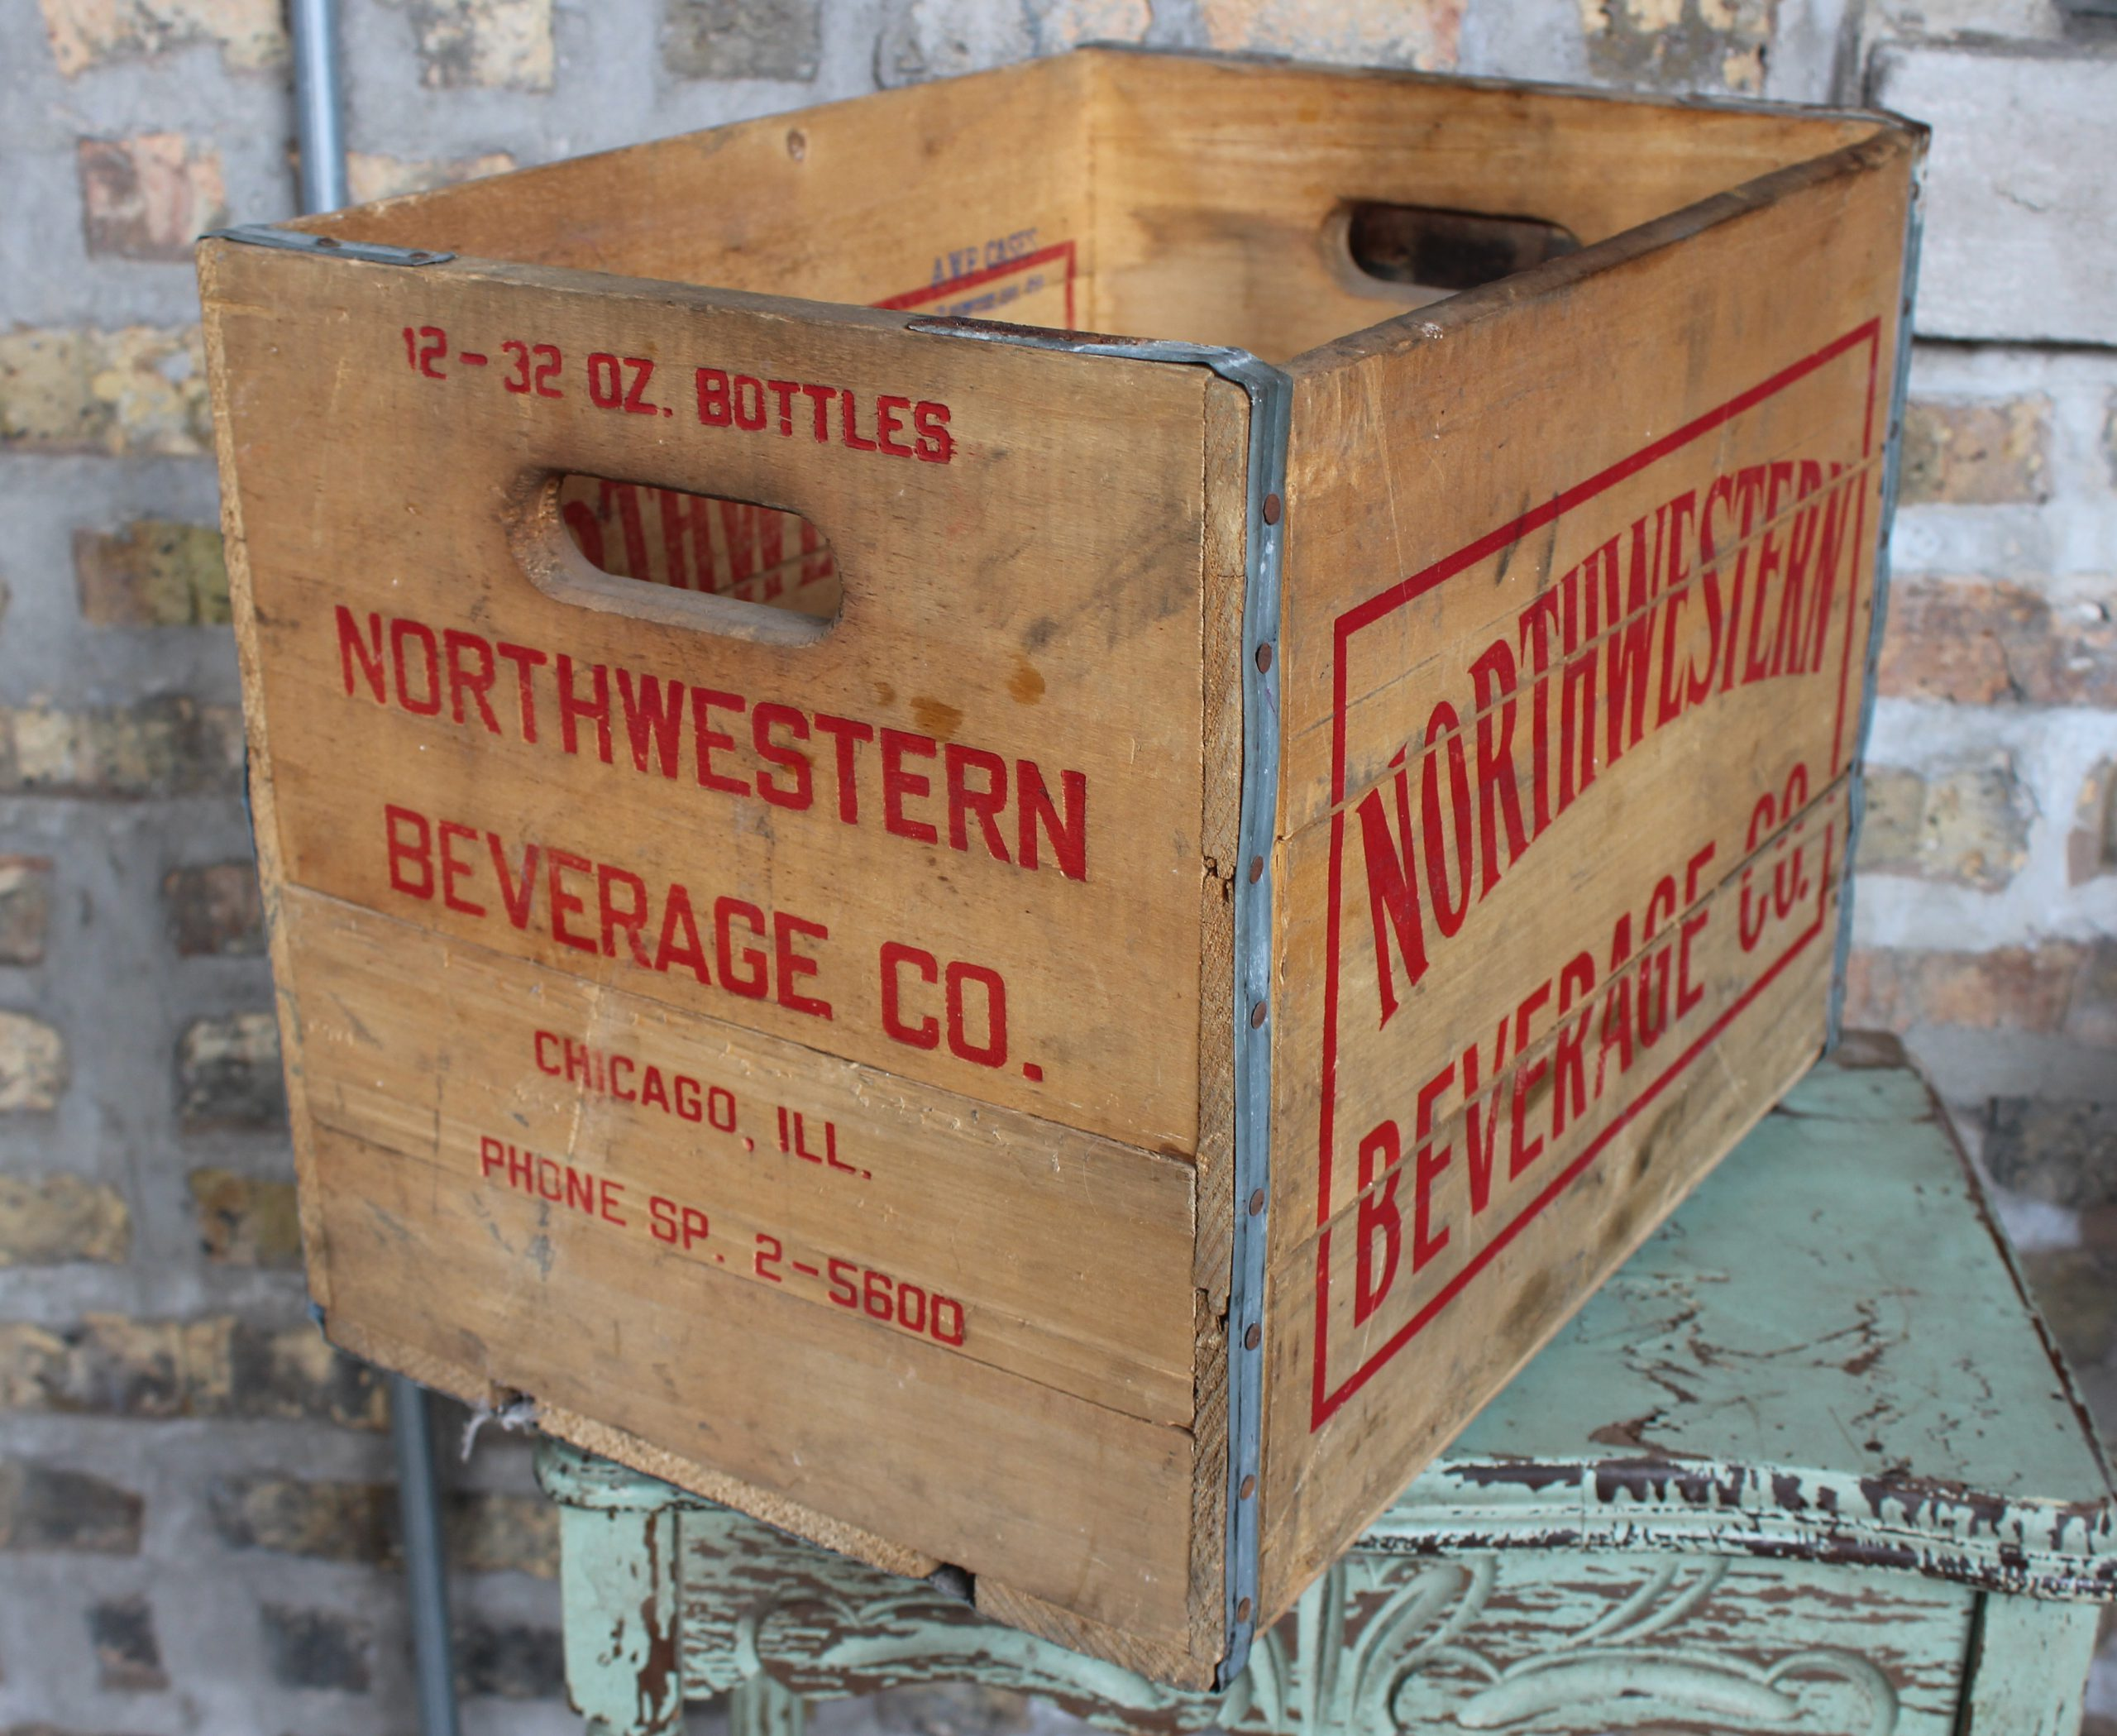 Northwestern Beverage Company History